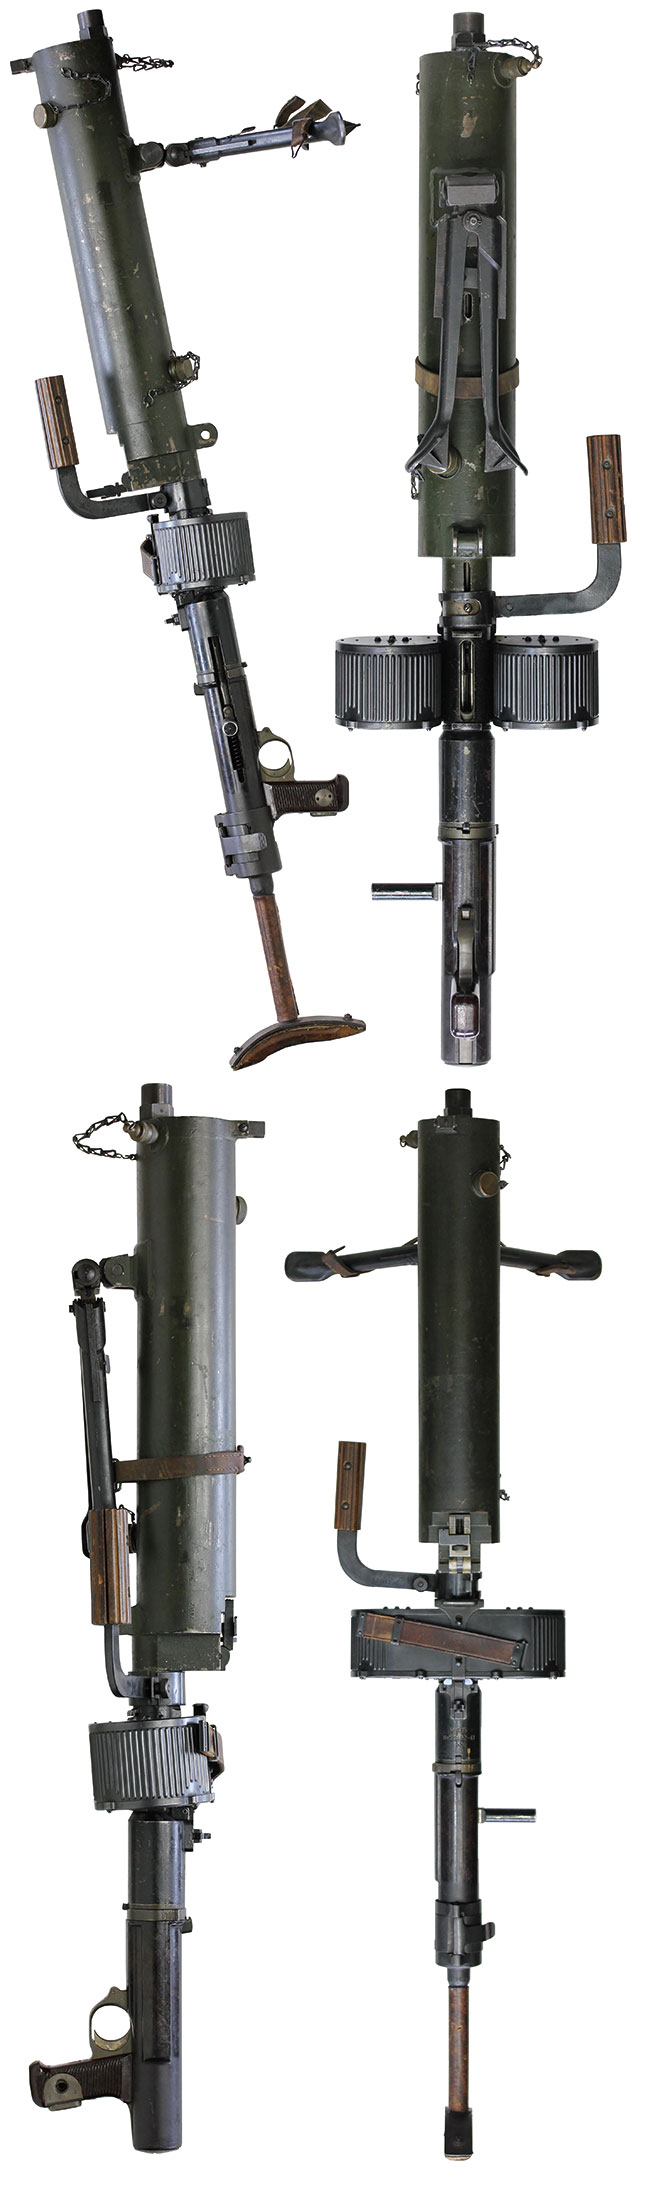 【4256】MG15-水冷式軽機関銃-地上転用型-(#F145701)右.jpg